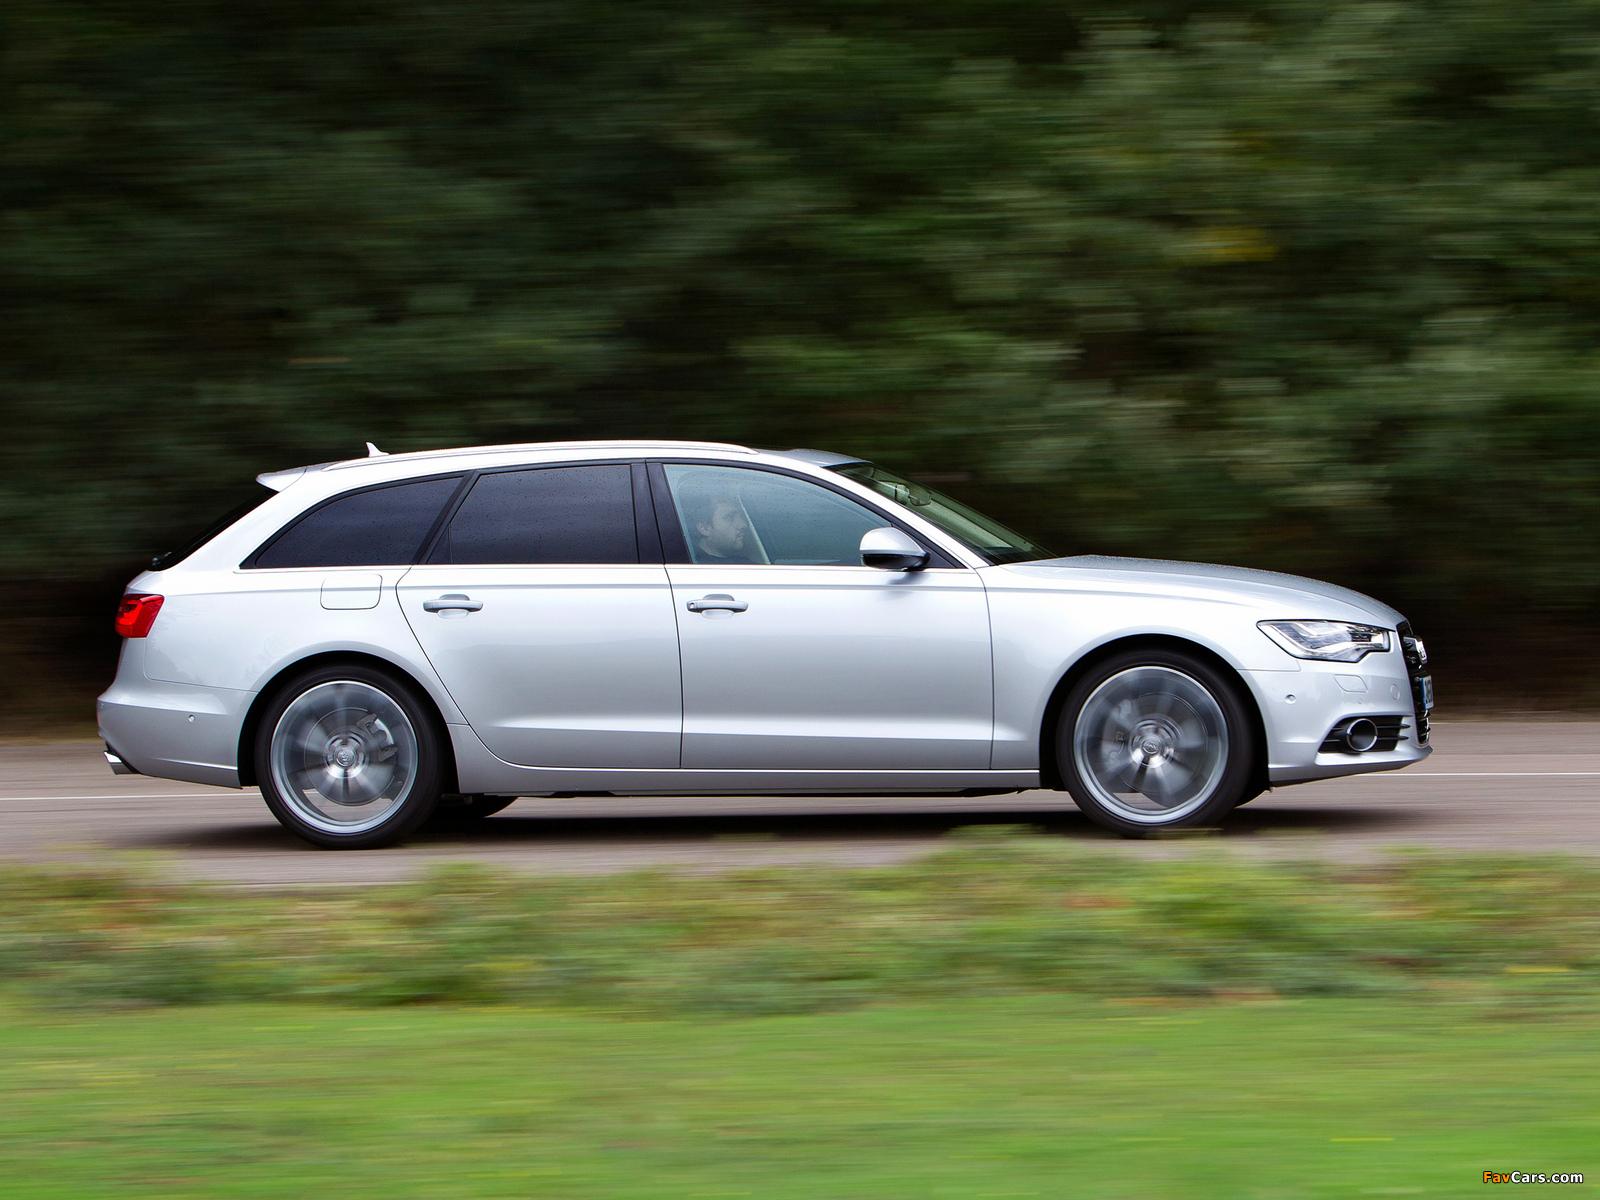 Audi A6 3 0 Tdi Avant Uk Spec 4g C7 2011 Images 1600x1200